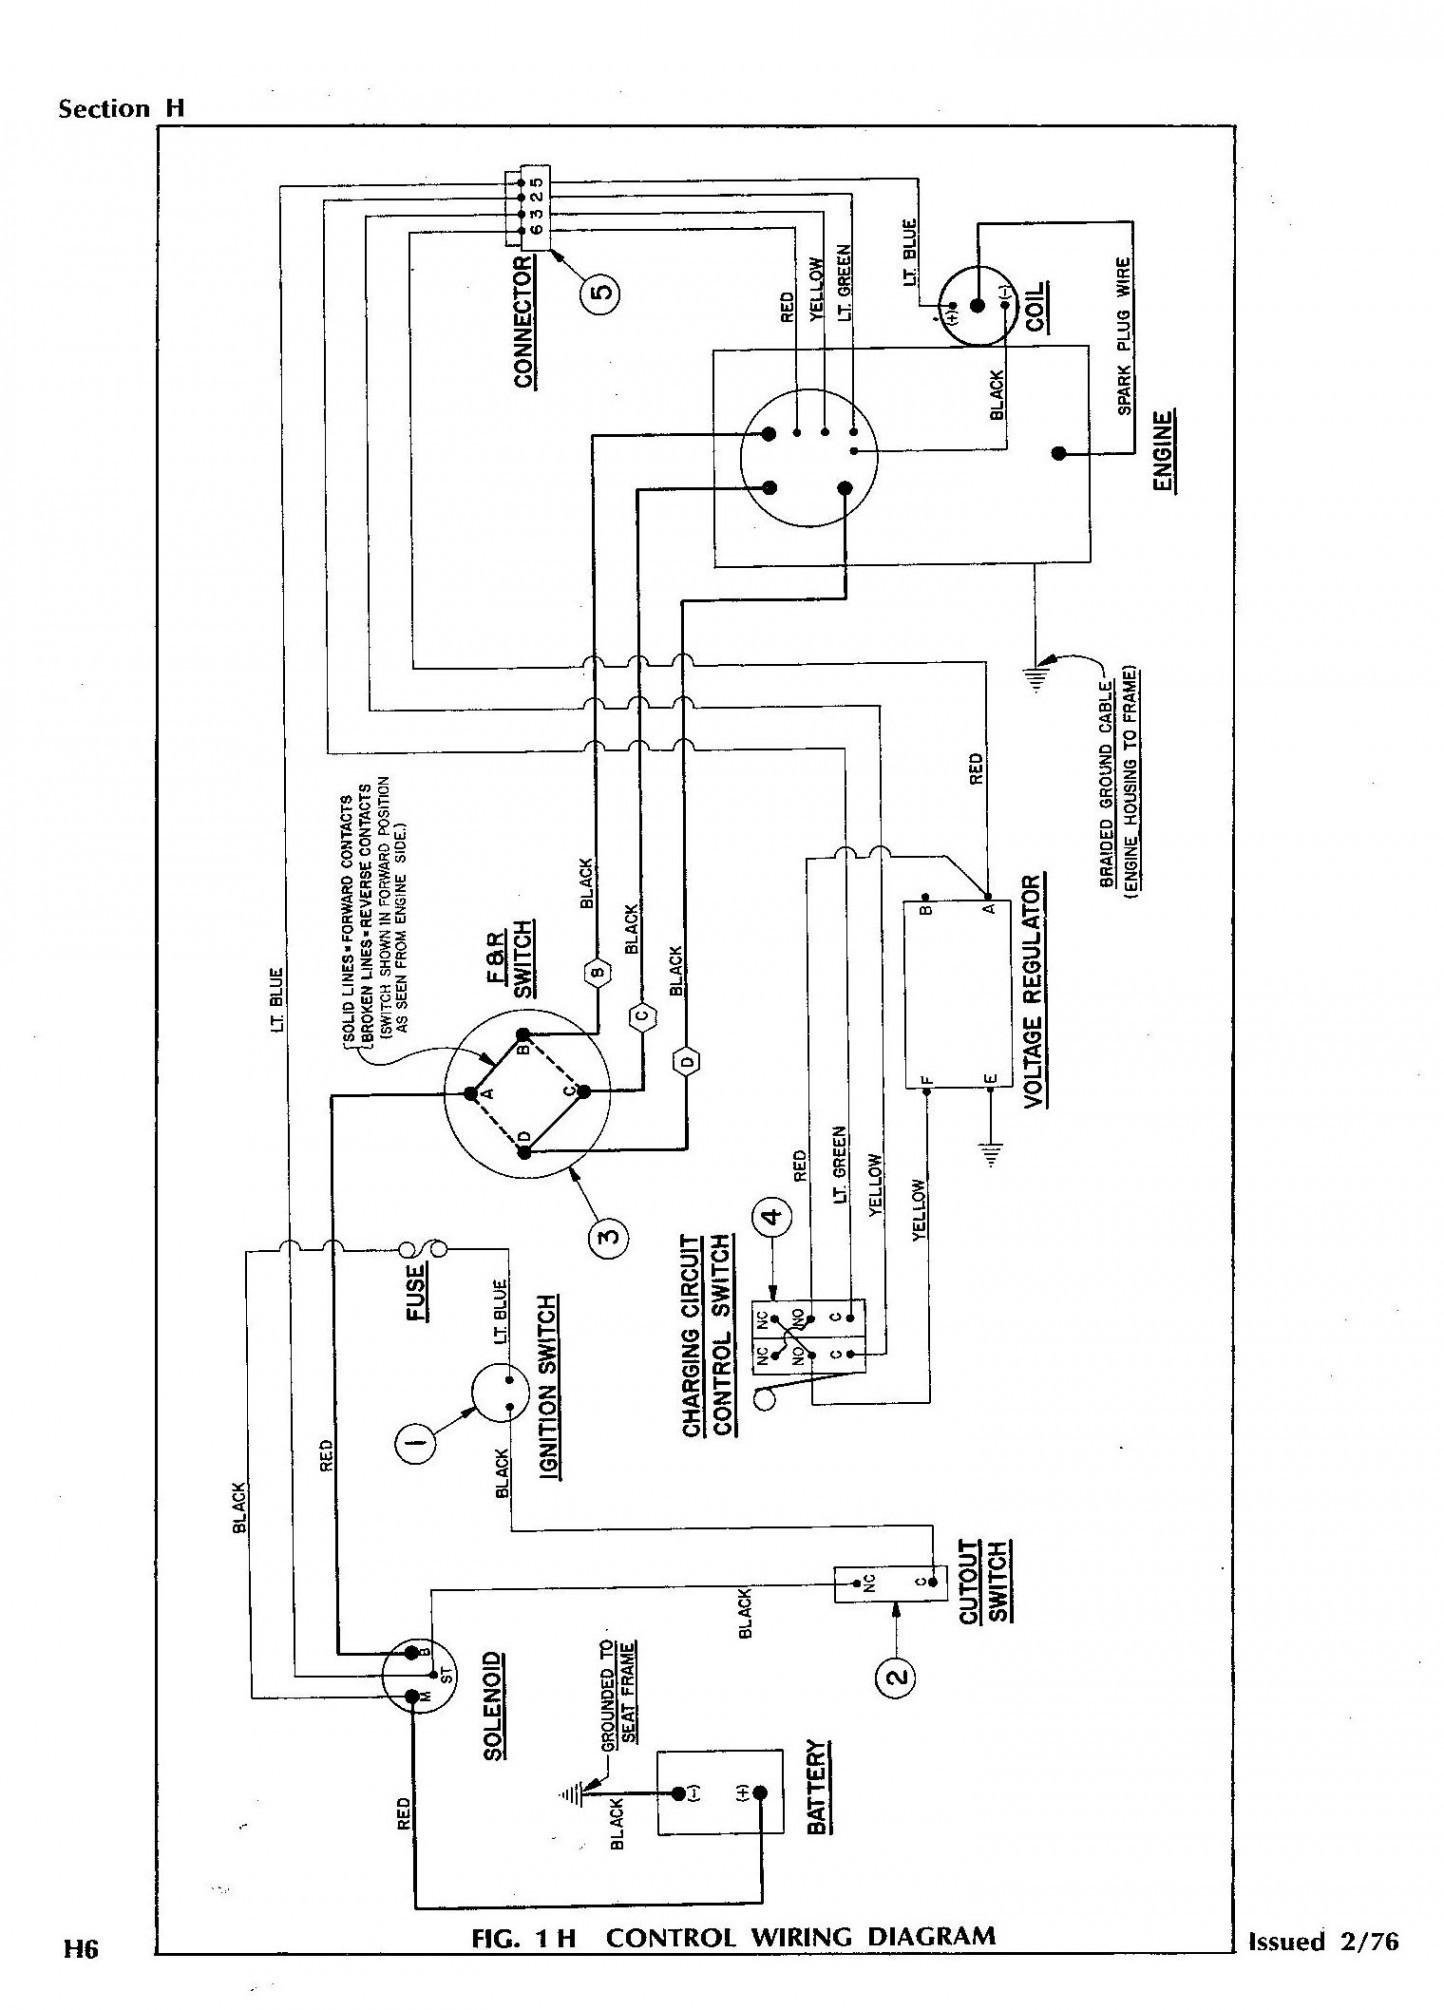 ezgo forward reverse switch wiring diagram porch lift ez go best library 1996 txt gas save golf